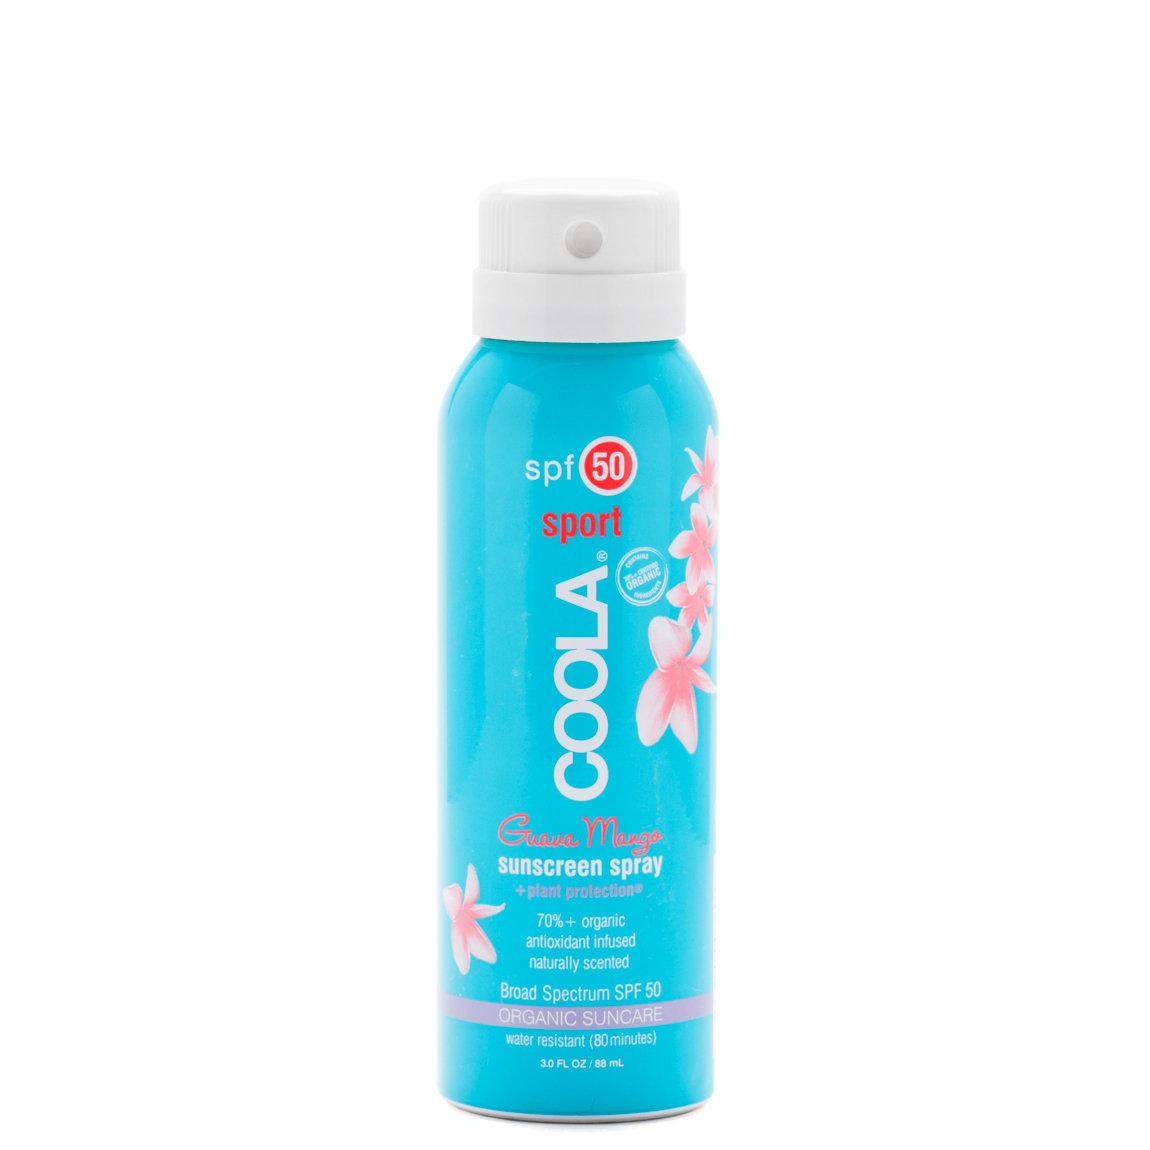 COOLA Travel Sport Sunscreen Spray SPF 50 Guava Mango alternative view 1 - product swatch.